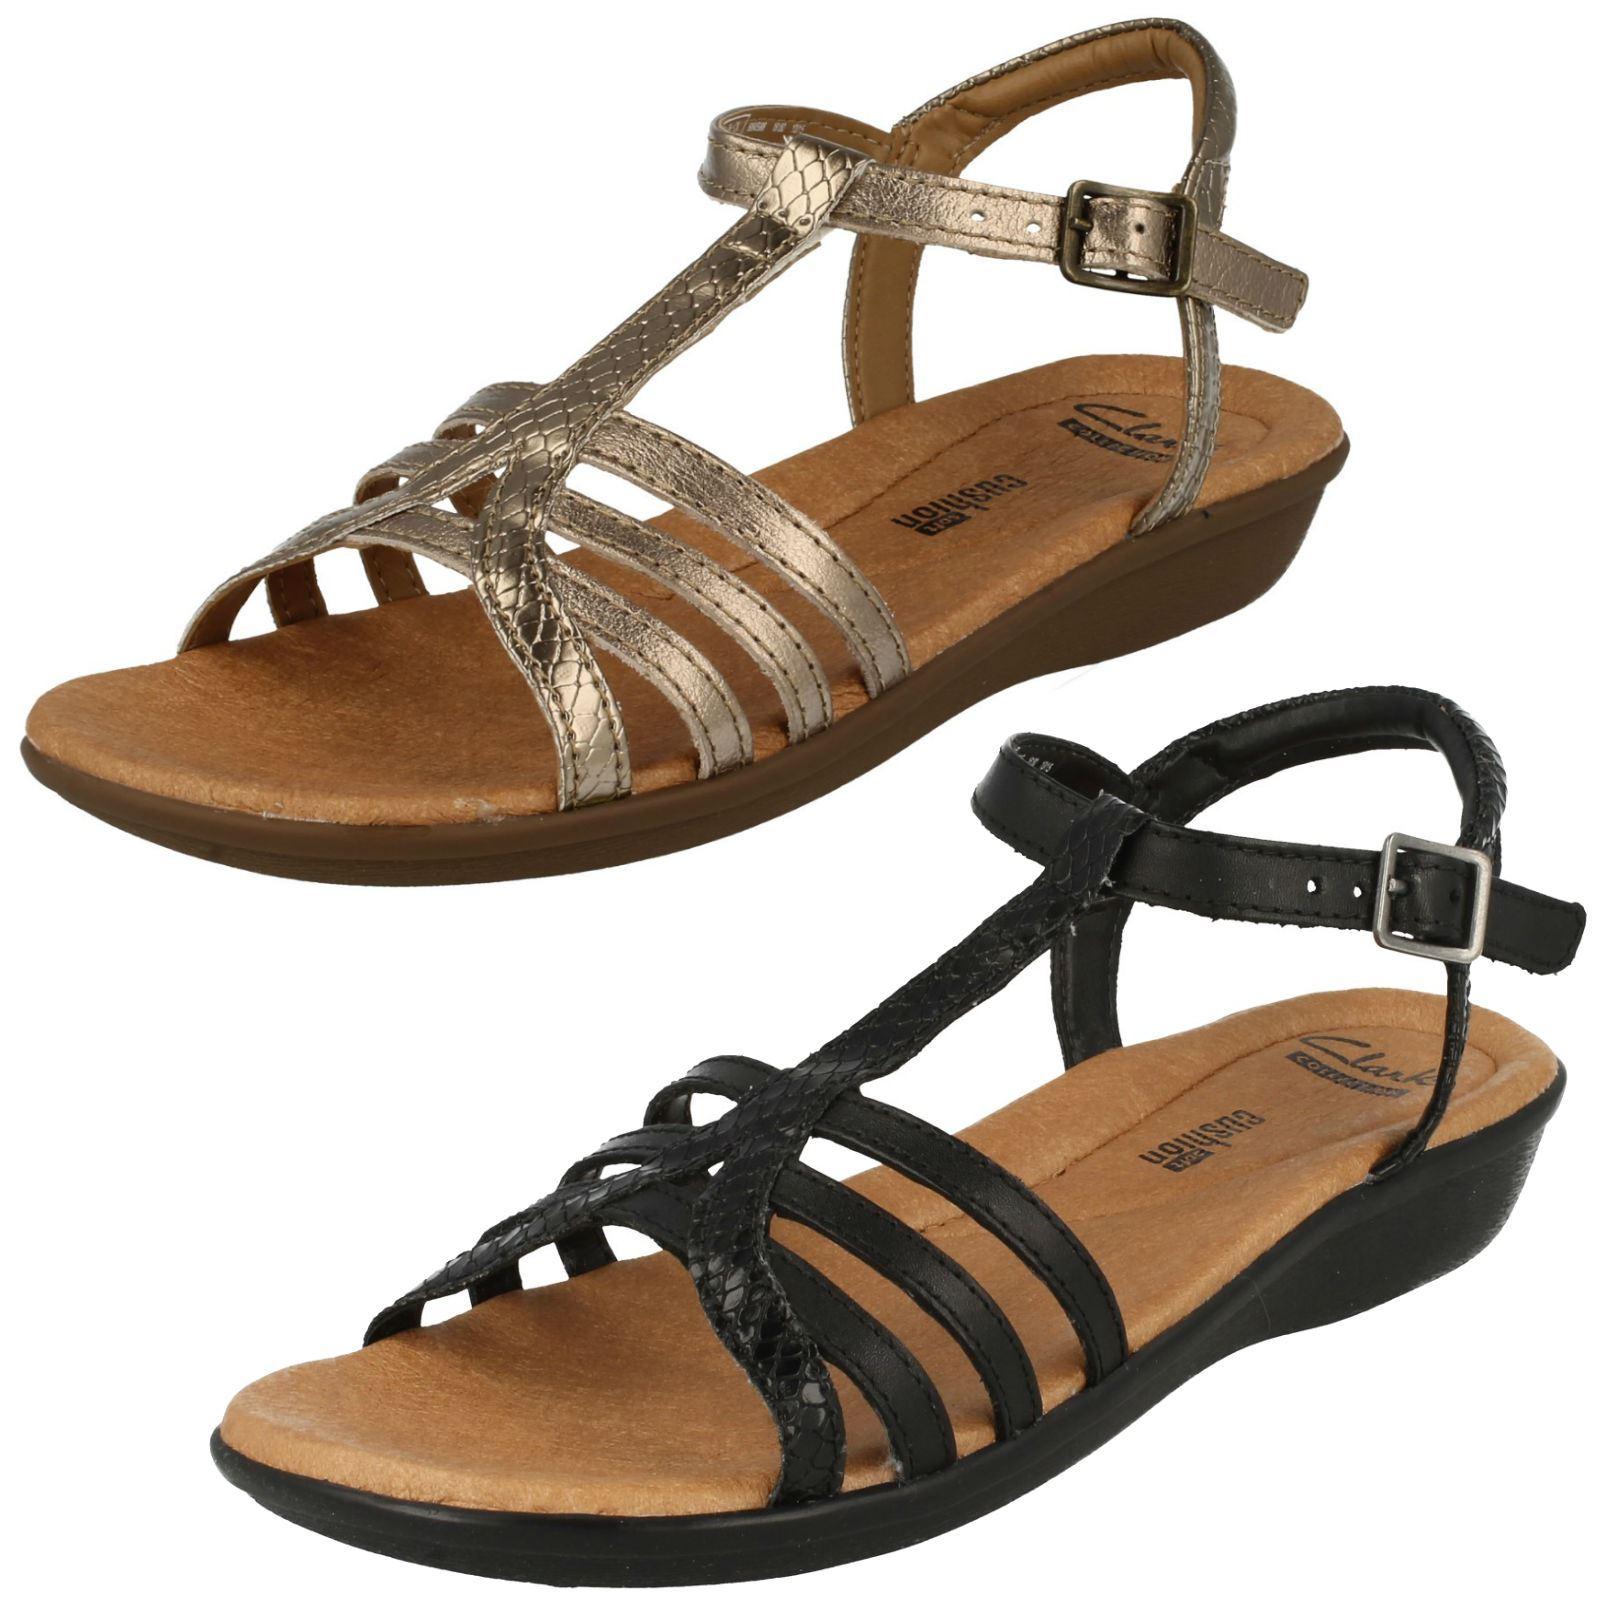 9ed355bda Details about Ladies Clarks Sandals Manilla Porta